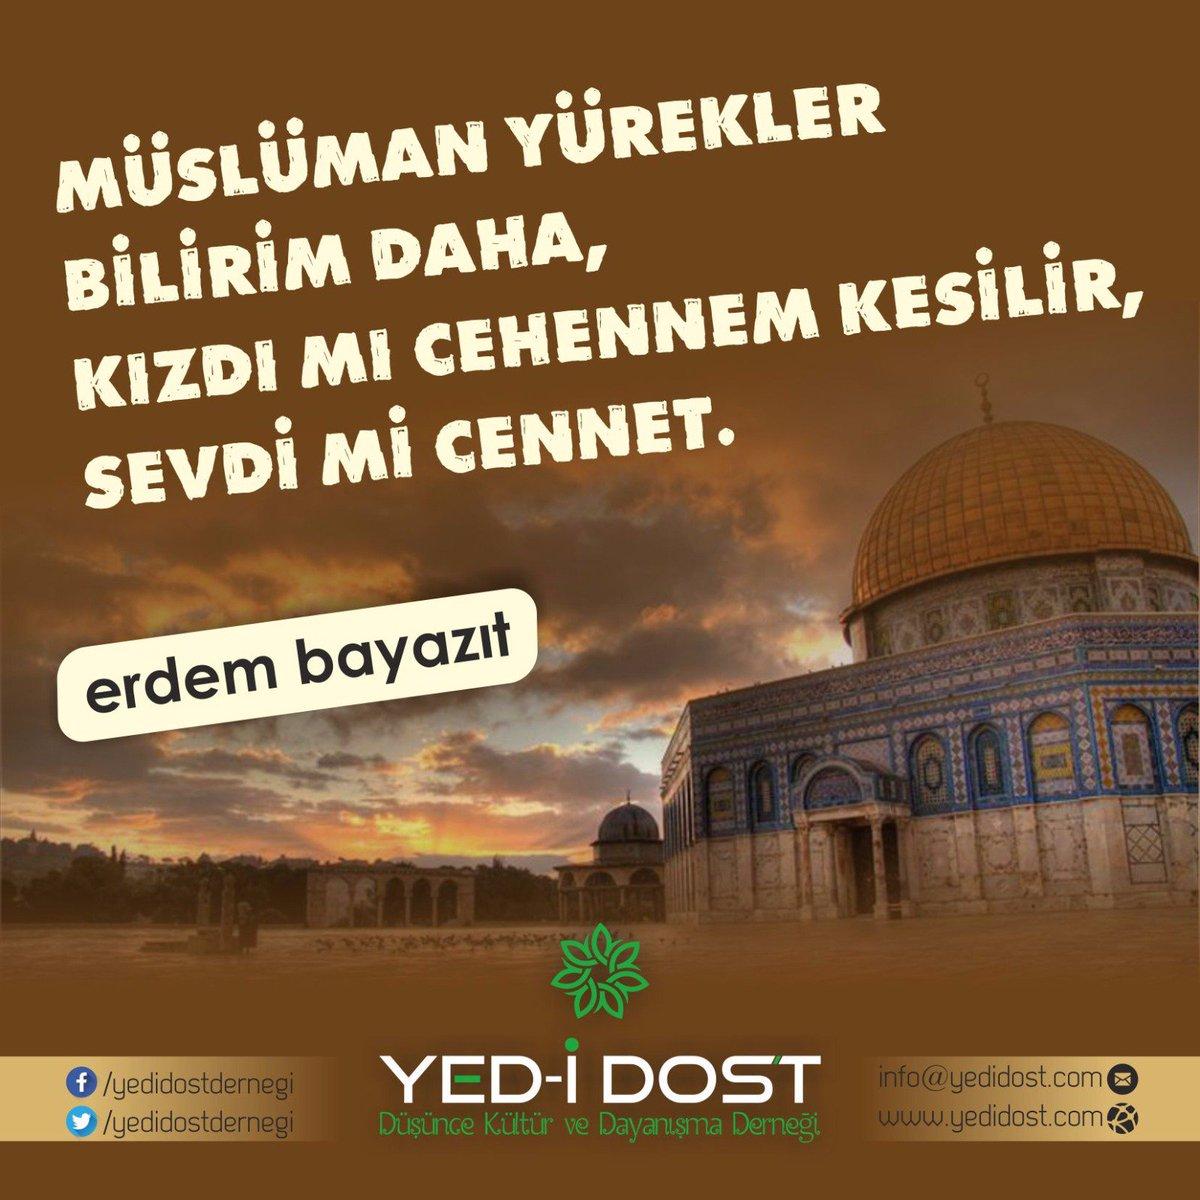 RT @iksbayan: #islamDünyasıUYAN  #KudüseSahipÇık https://t.co/9aNYv847Dq